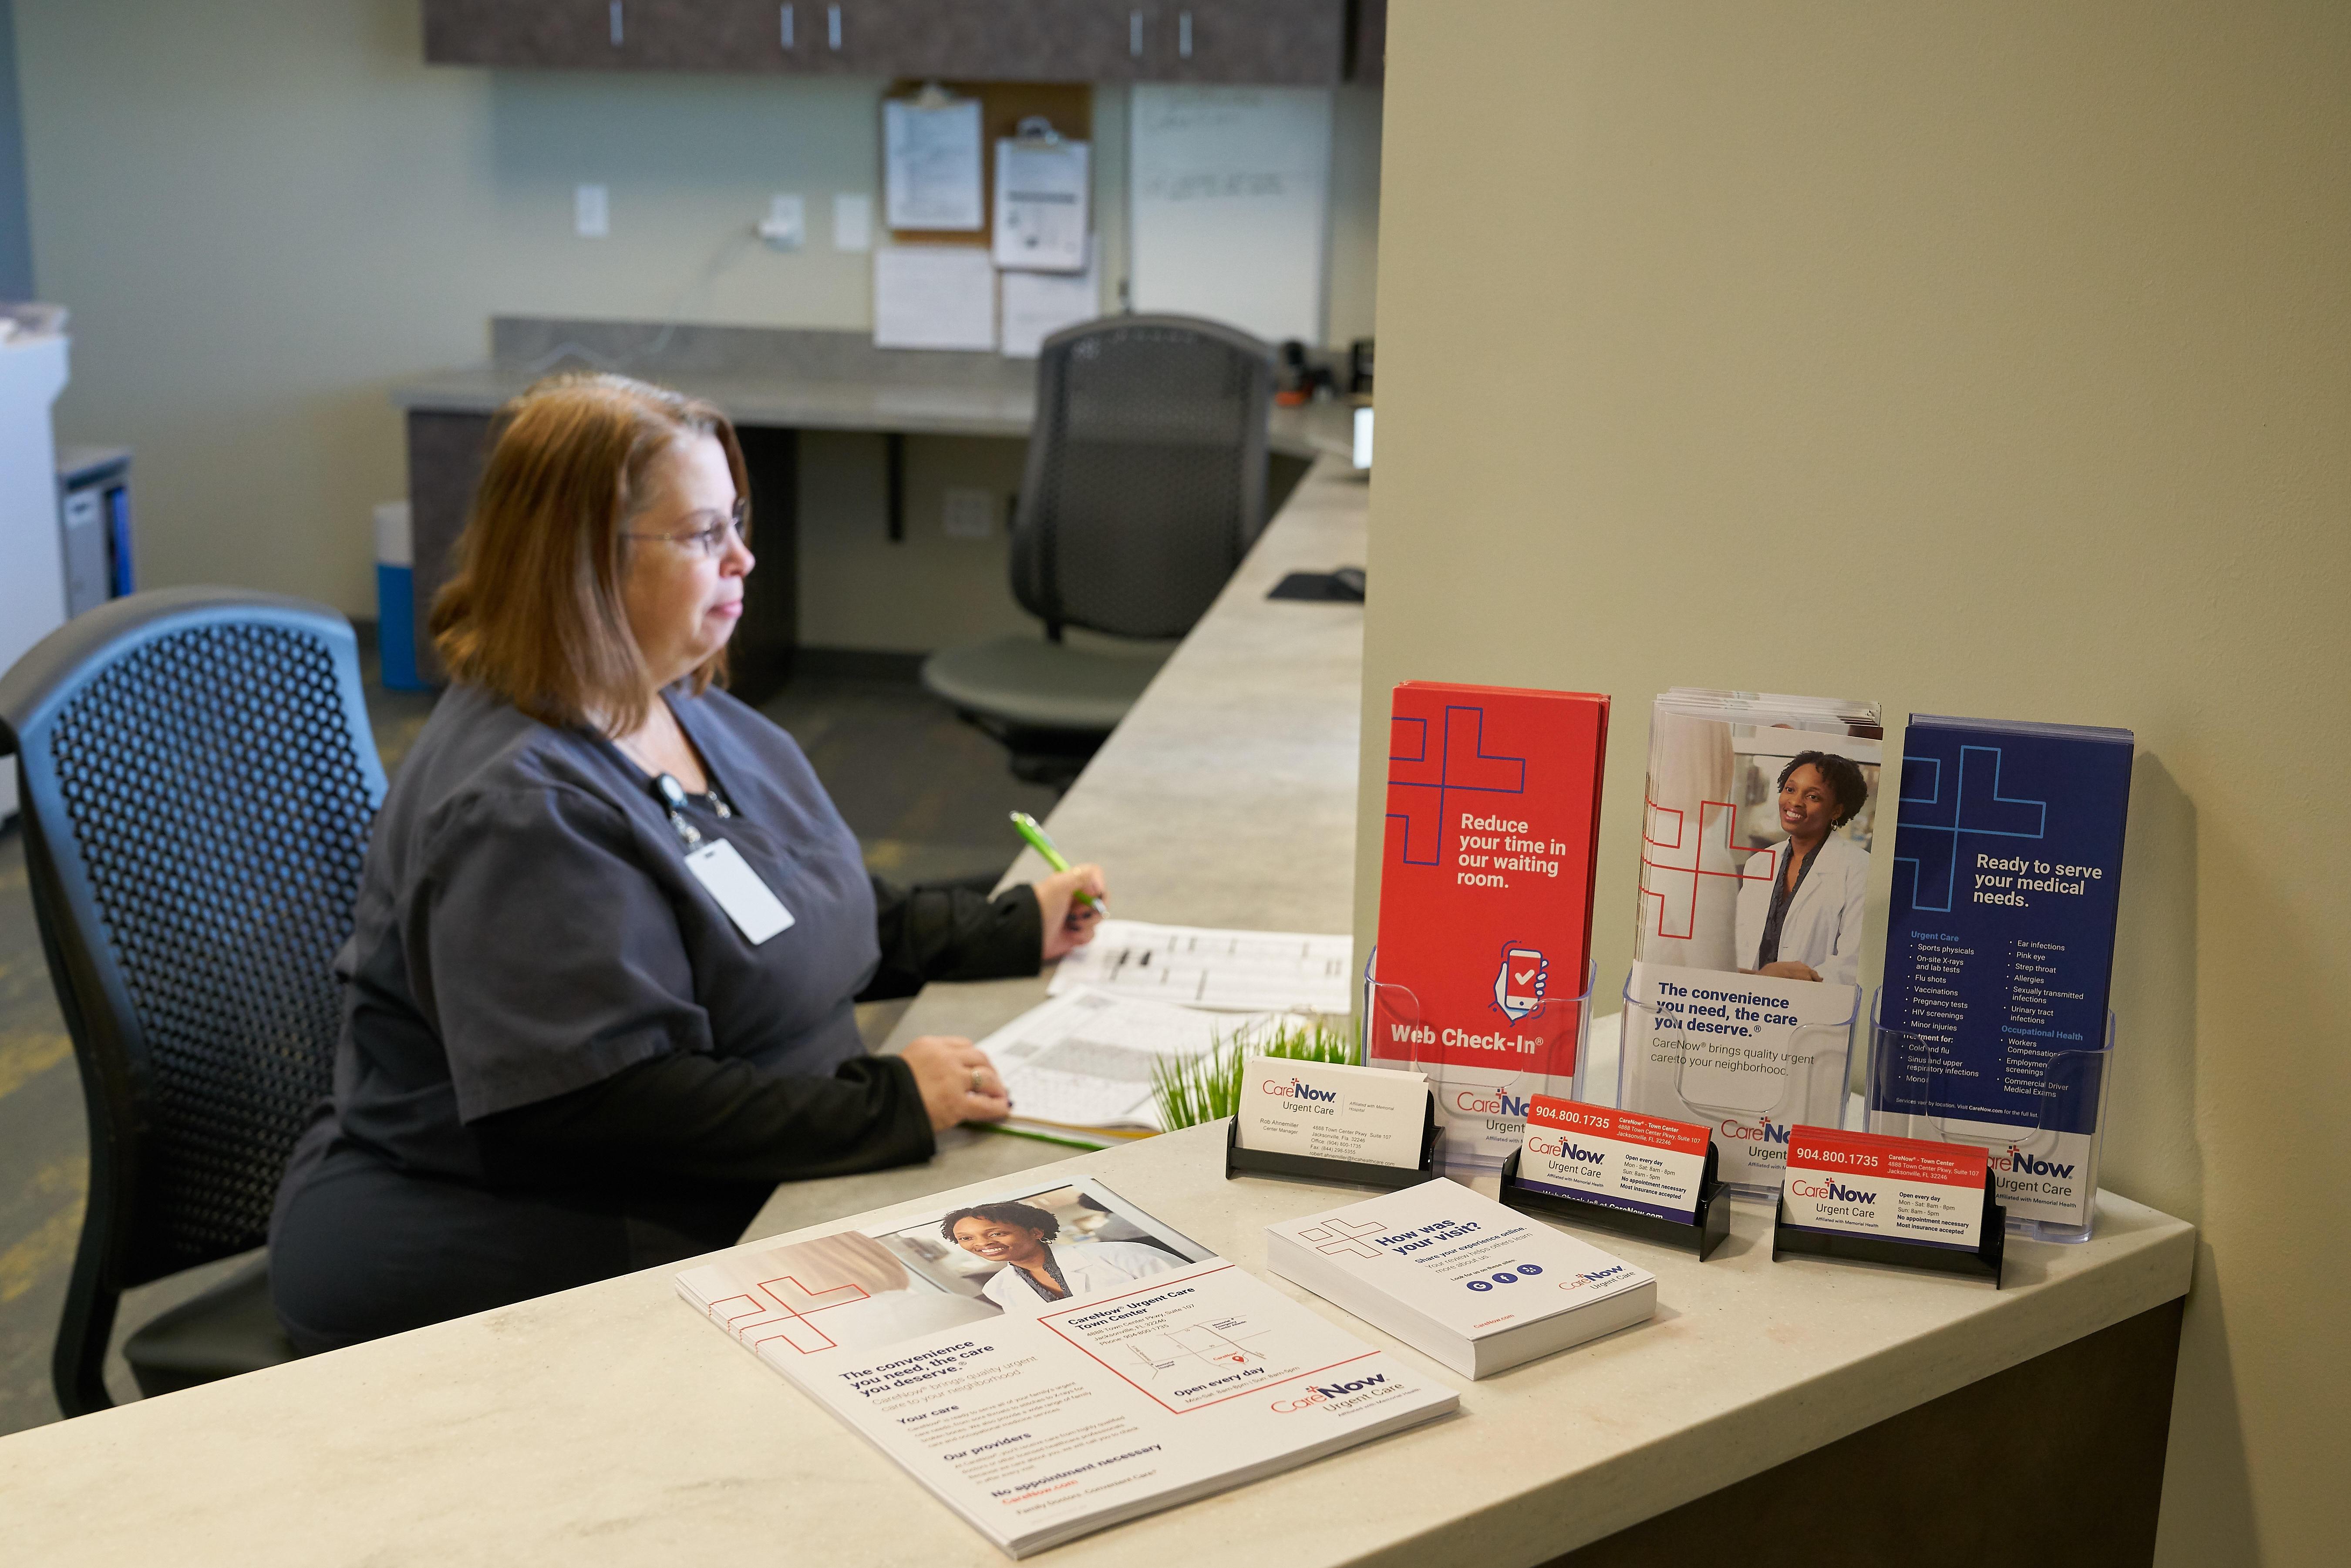 CareNow Urgent Care - Jacksonville Town Center image 1